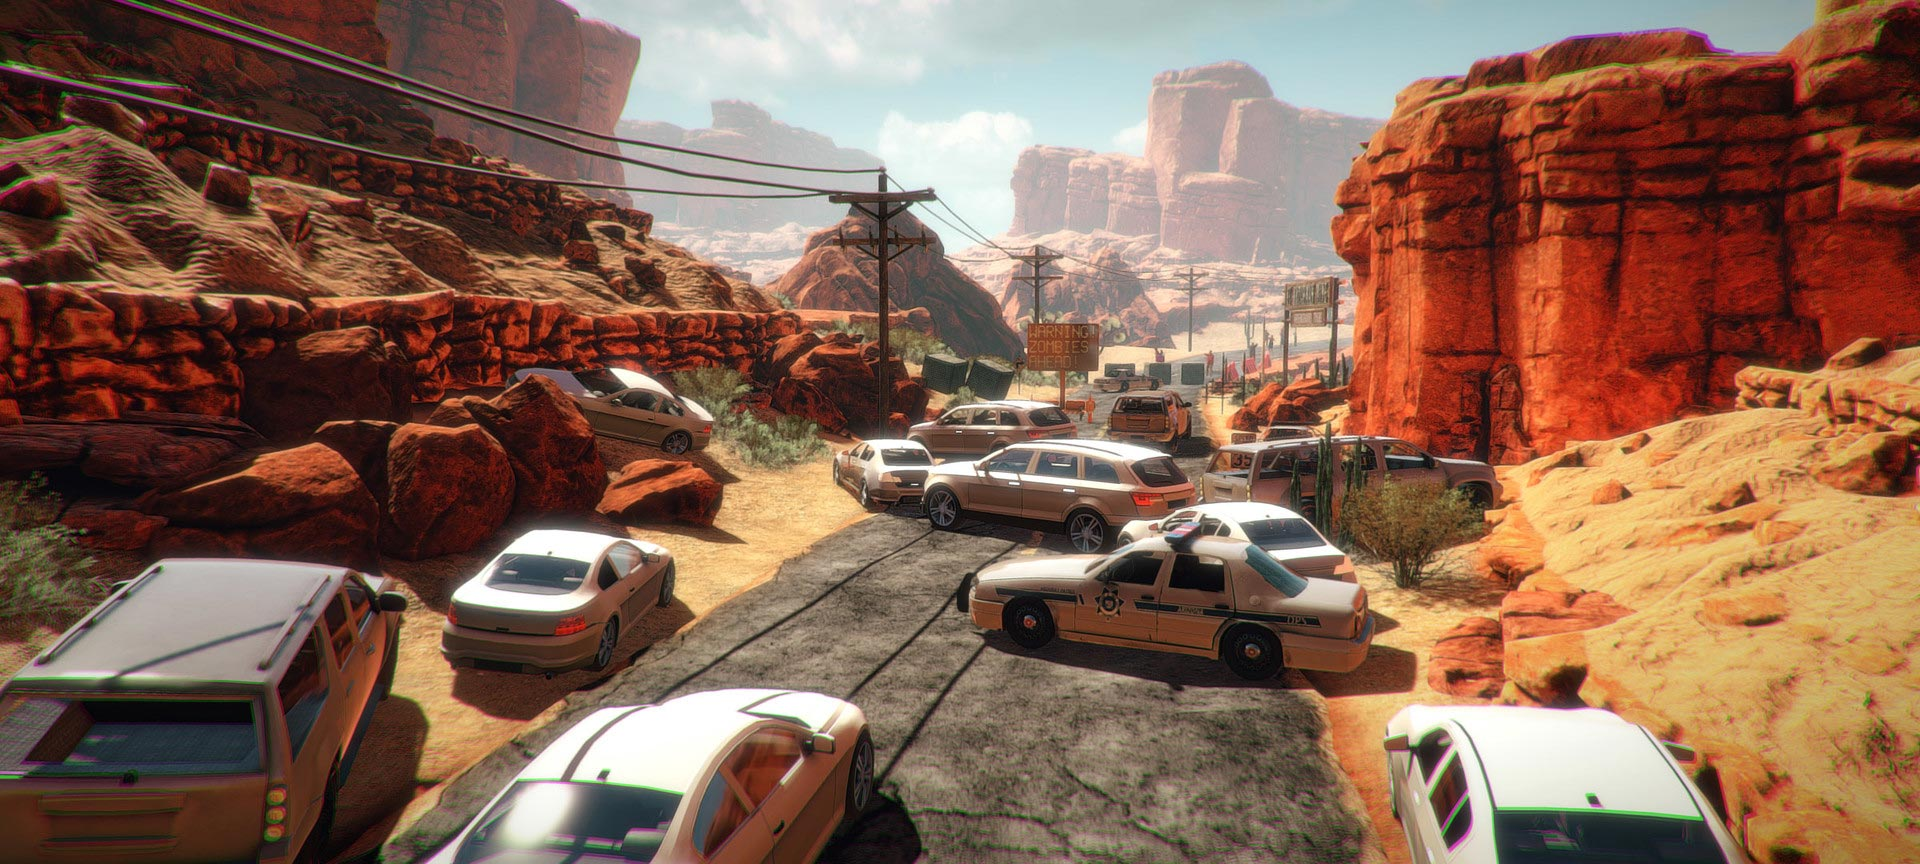 Arizona Sunshine sur PSVR